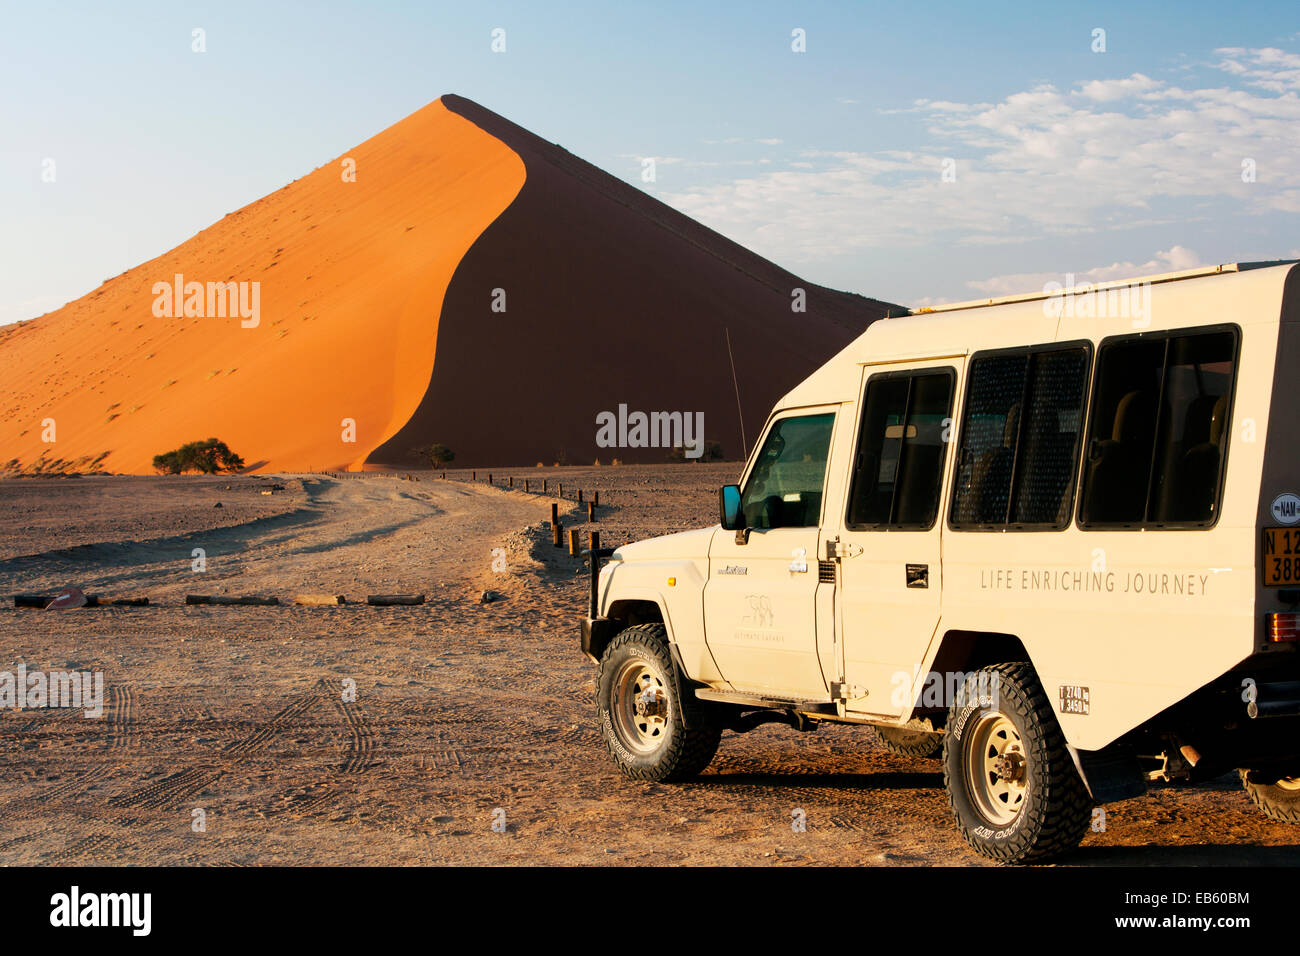 Safari Vehicle and Sand Dune in Sossusvlei National Park - Namib-Naukluft National Park, Namibia, Africa - Stock Image